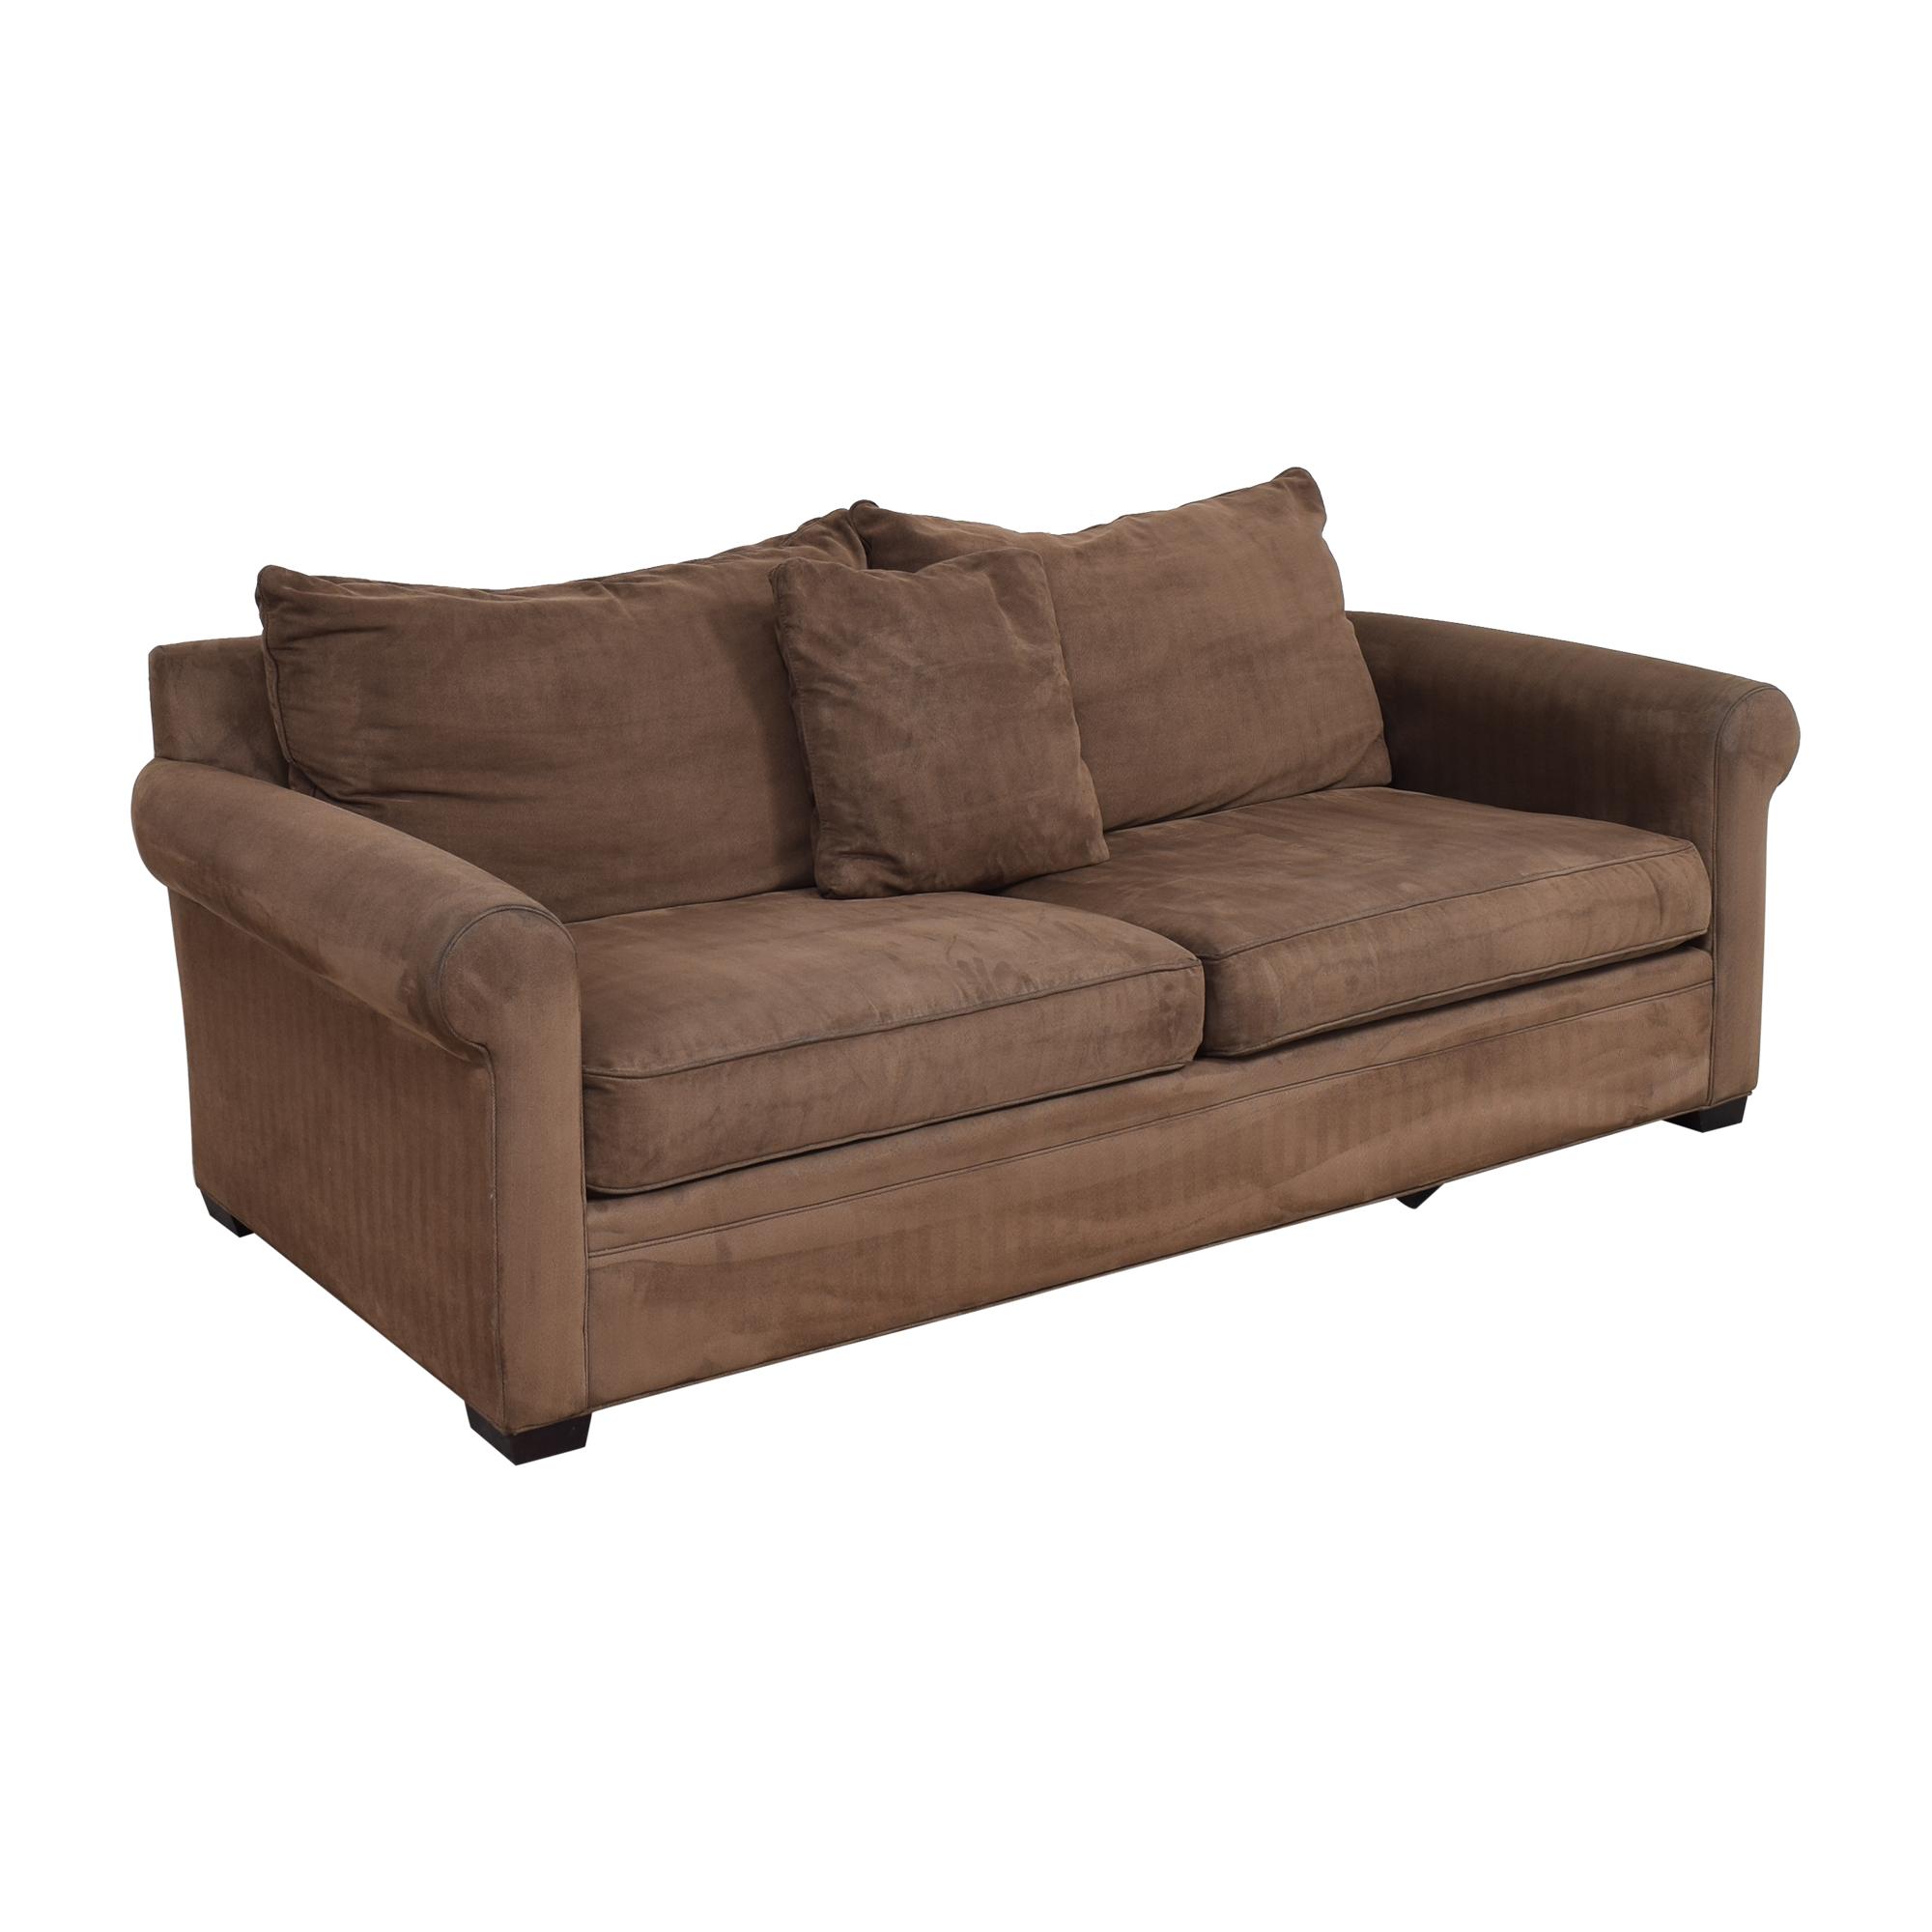 Macy's Macy's Modern Concepts Two Cushion Sofa nj